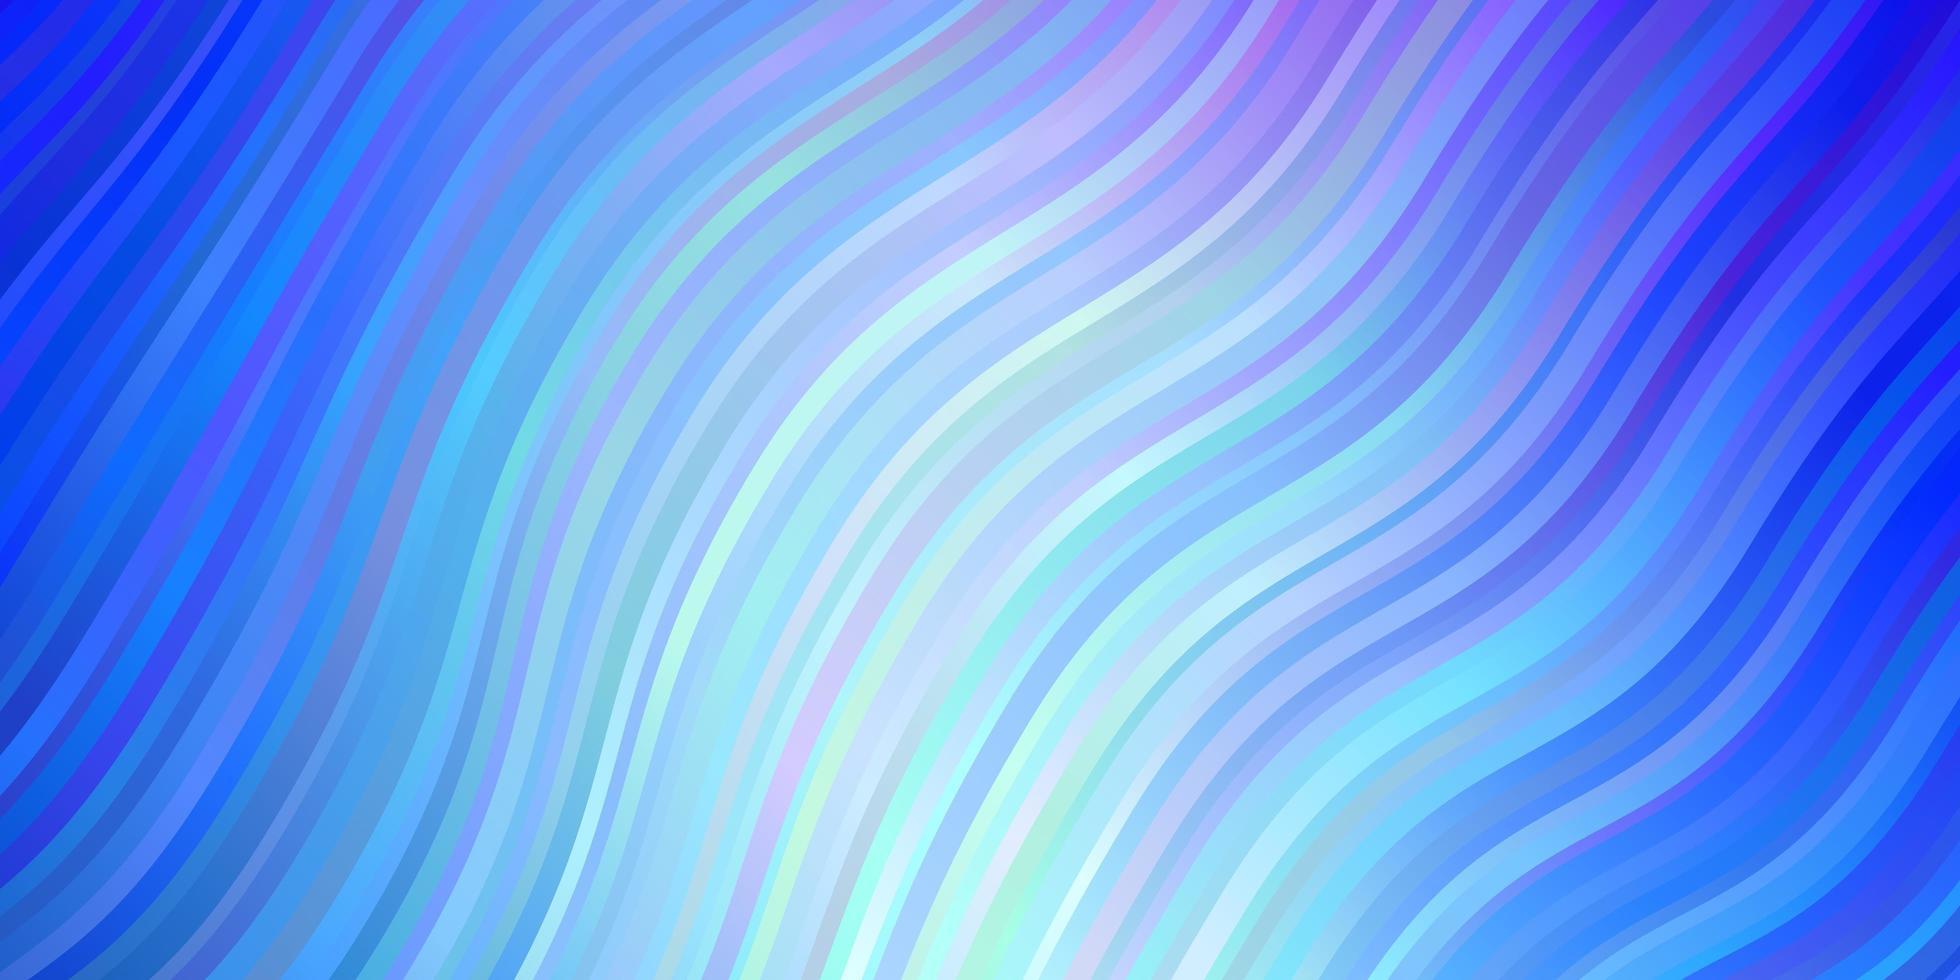 hellrosa, blaues Vektormuster mit schiefen Linien. vektor